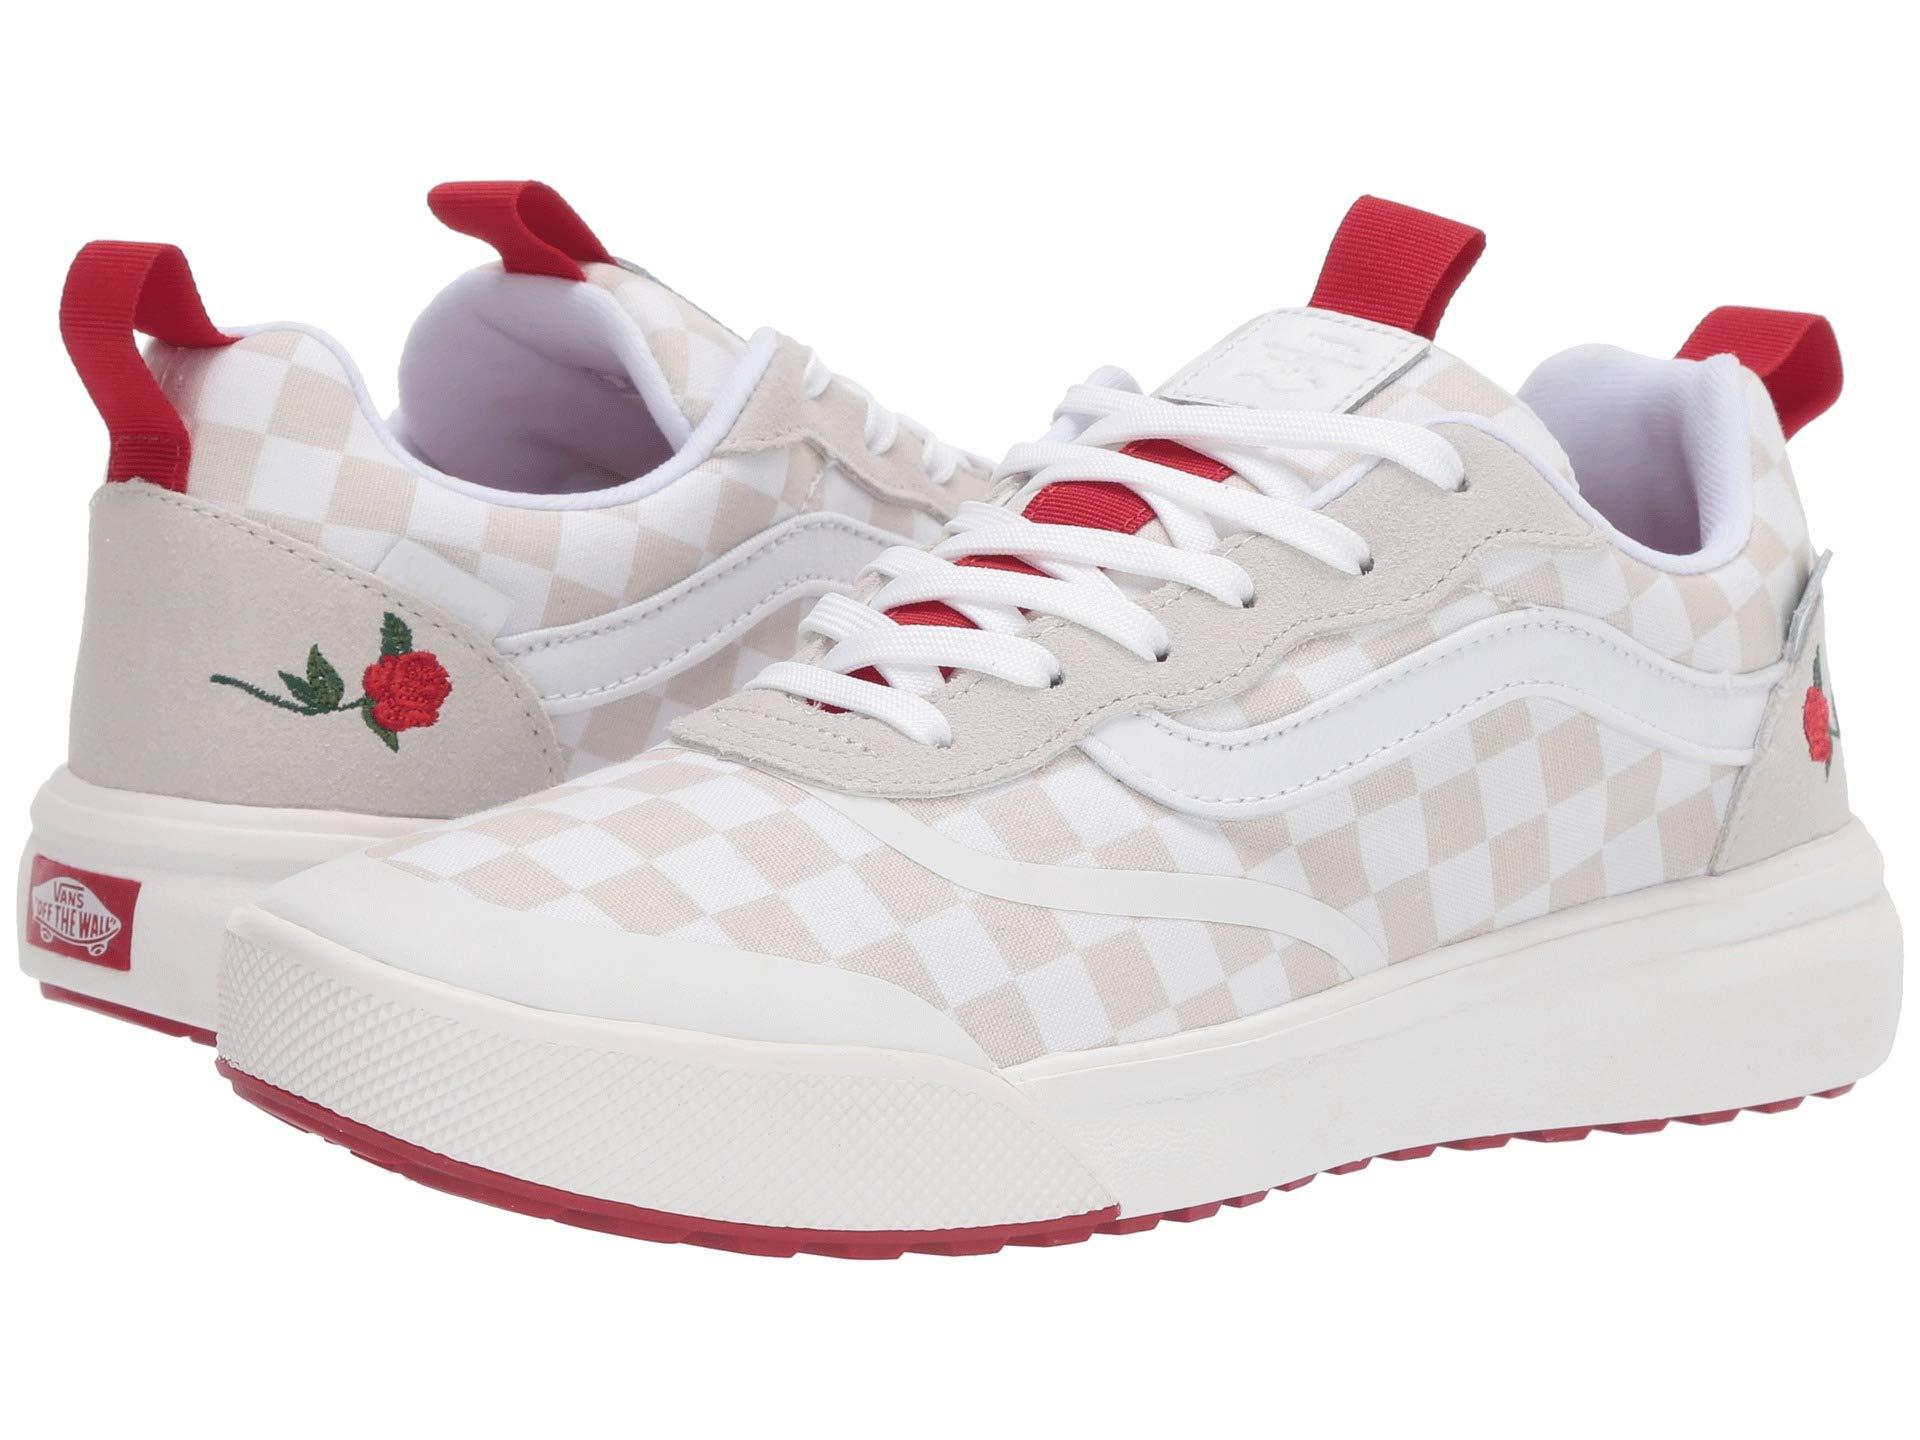 White Shoes Athletic Vans Hurst leila Ultrarange Rapidweld checkerboard  amp  Sneakers PSqzRIw f5008b328